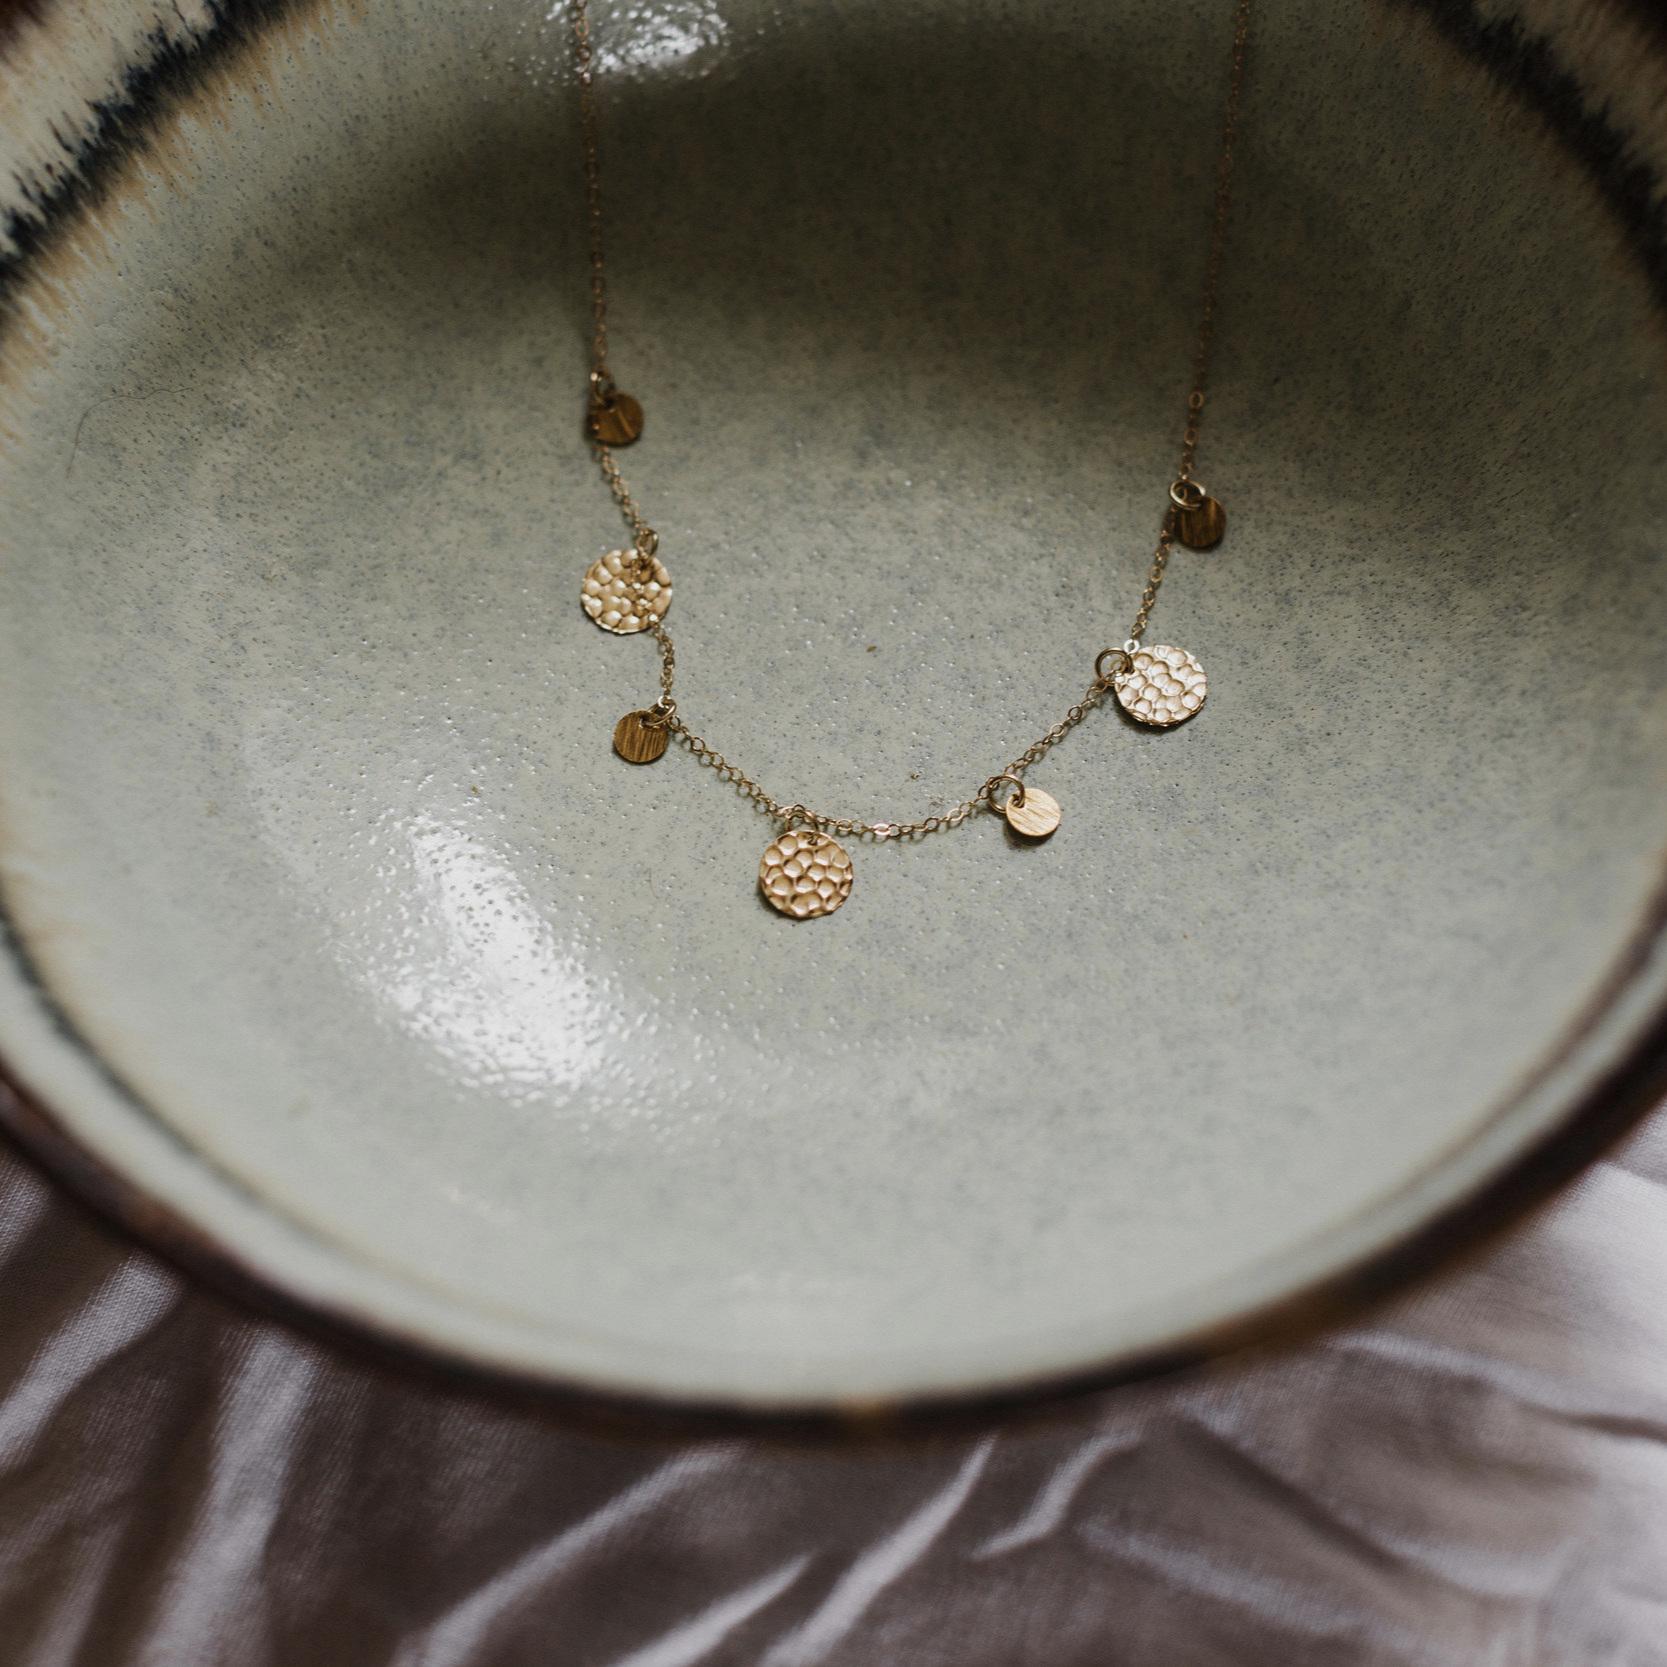 WELLSCO-OPERATIVE - The KENZIE necklace